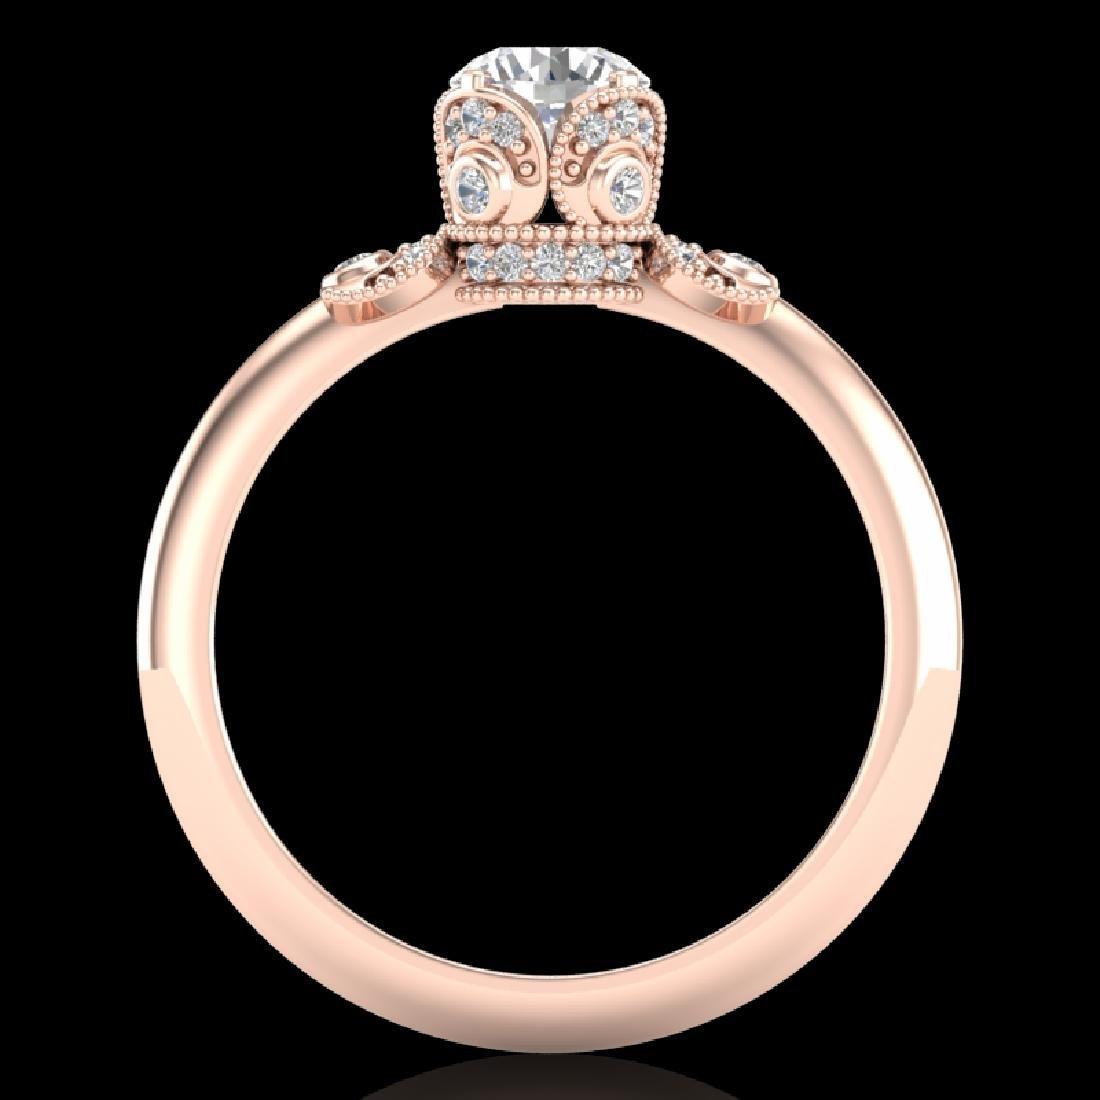 1 CTW VS/SI Diamond Solitaire Art Deco Ring 18K Rose - 2